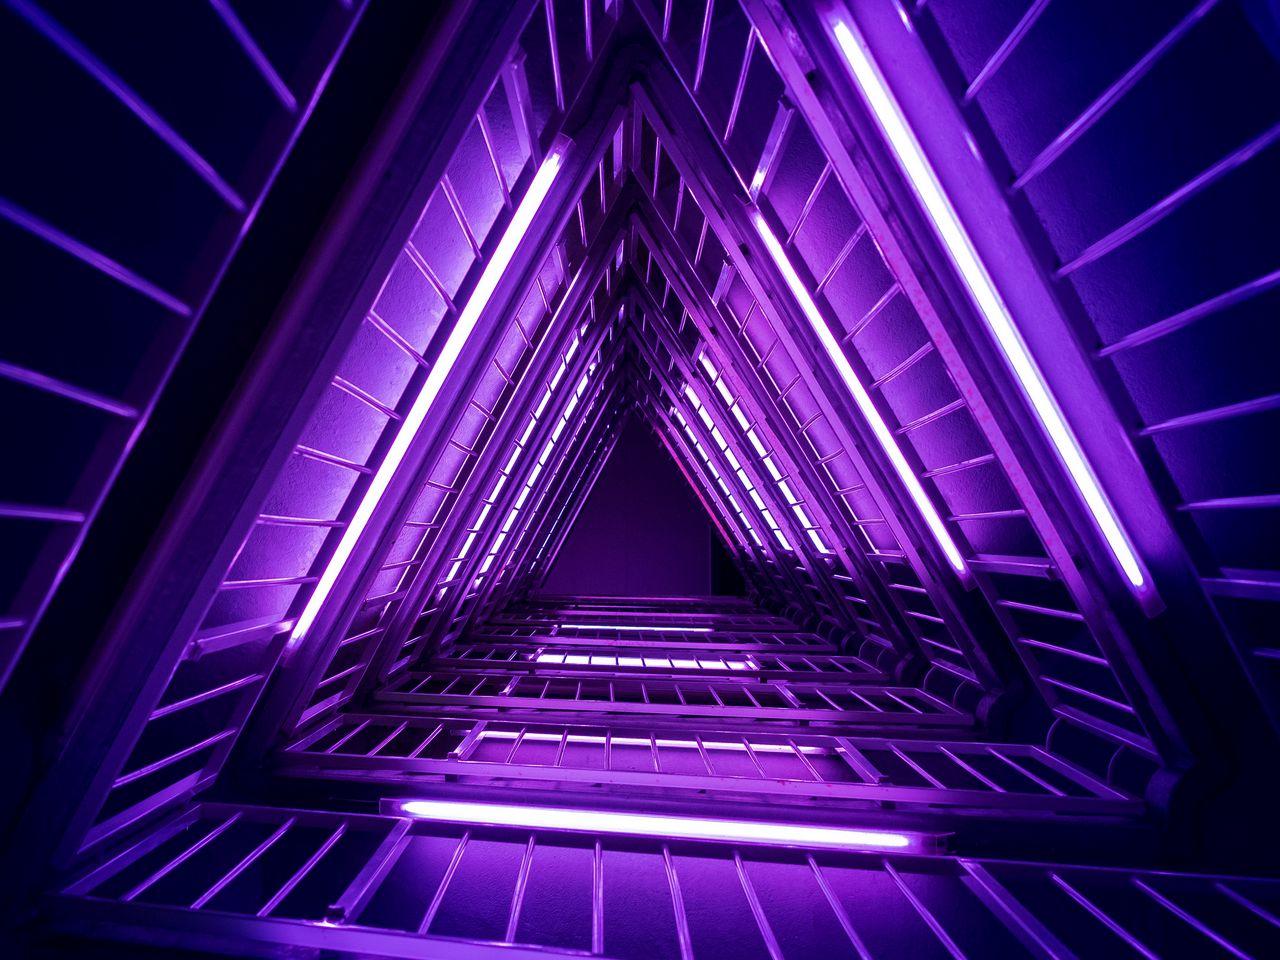 1280x960 Wallpaper ladder, purple, light